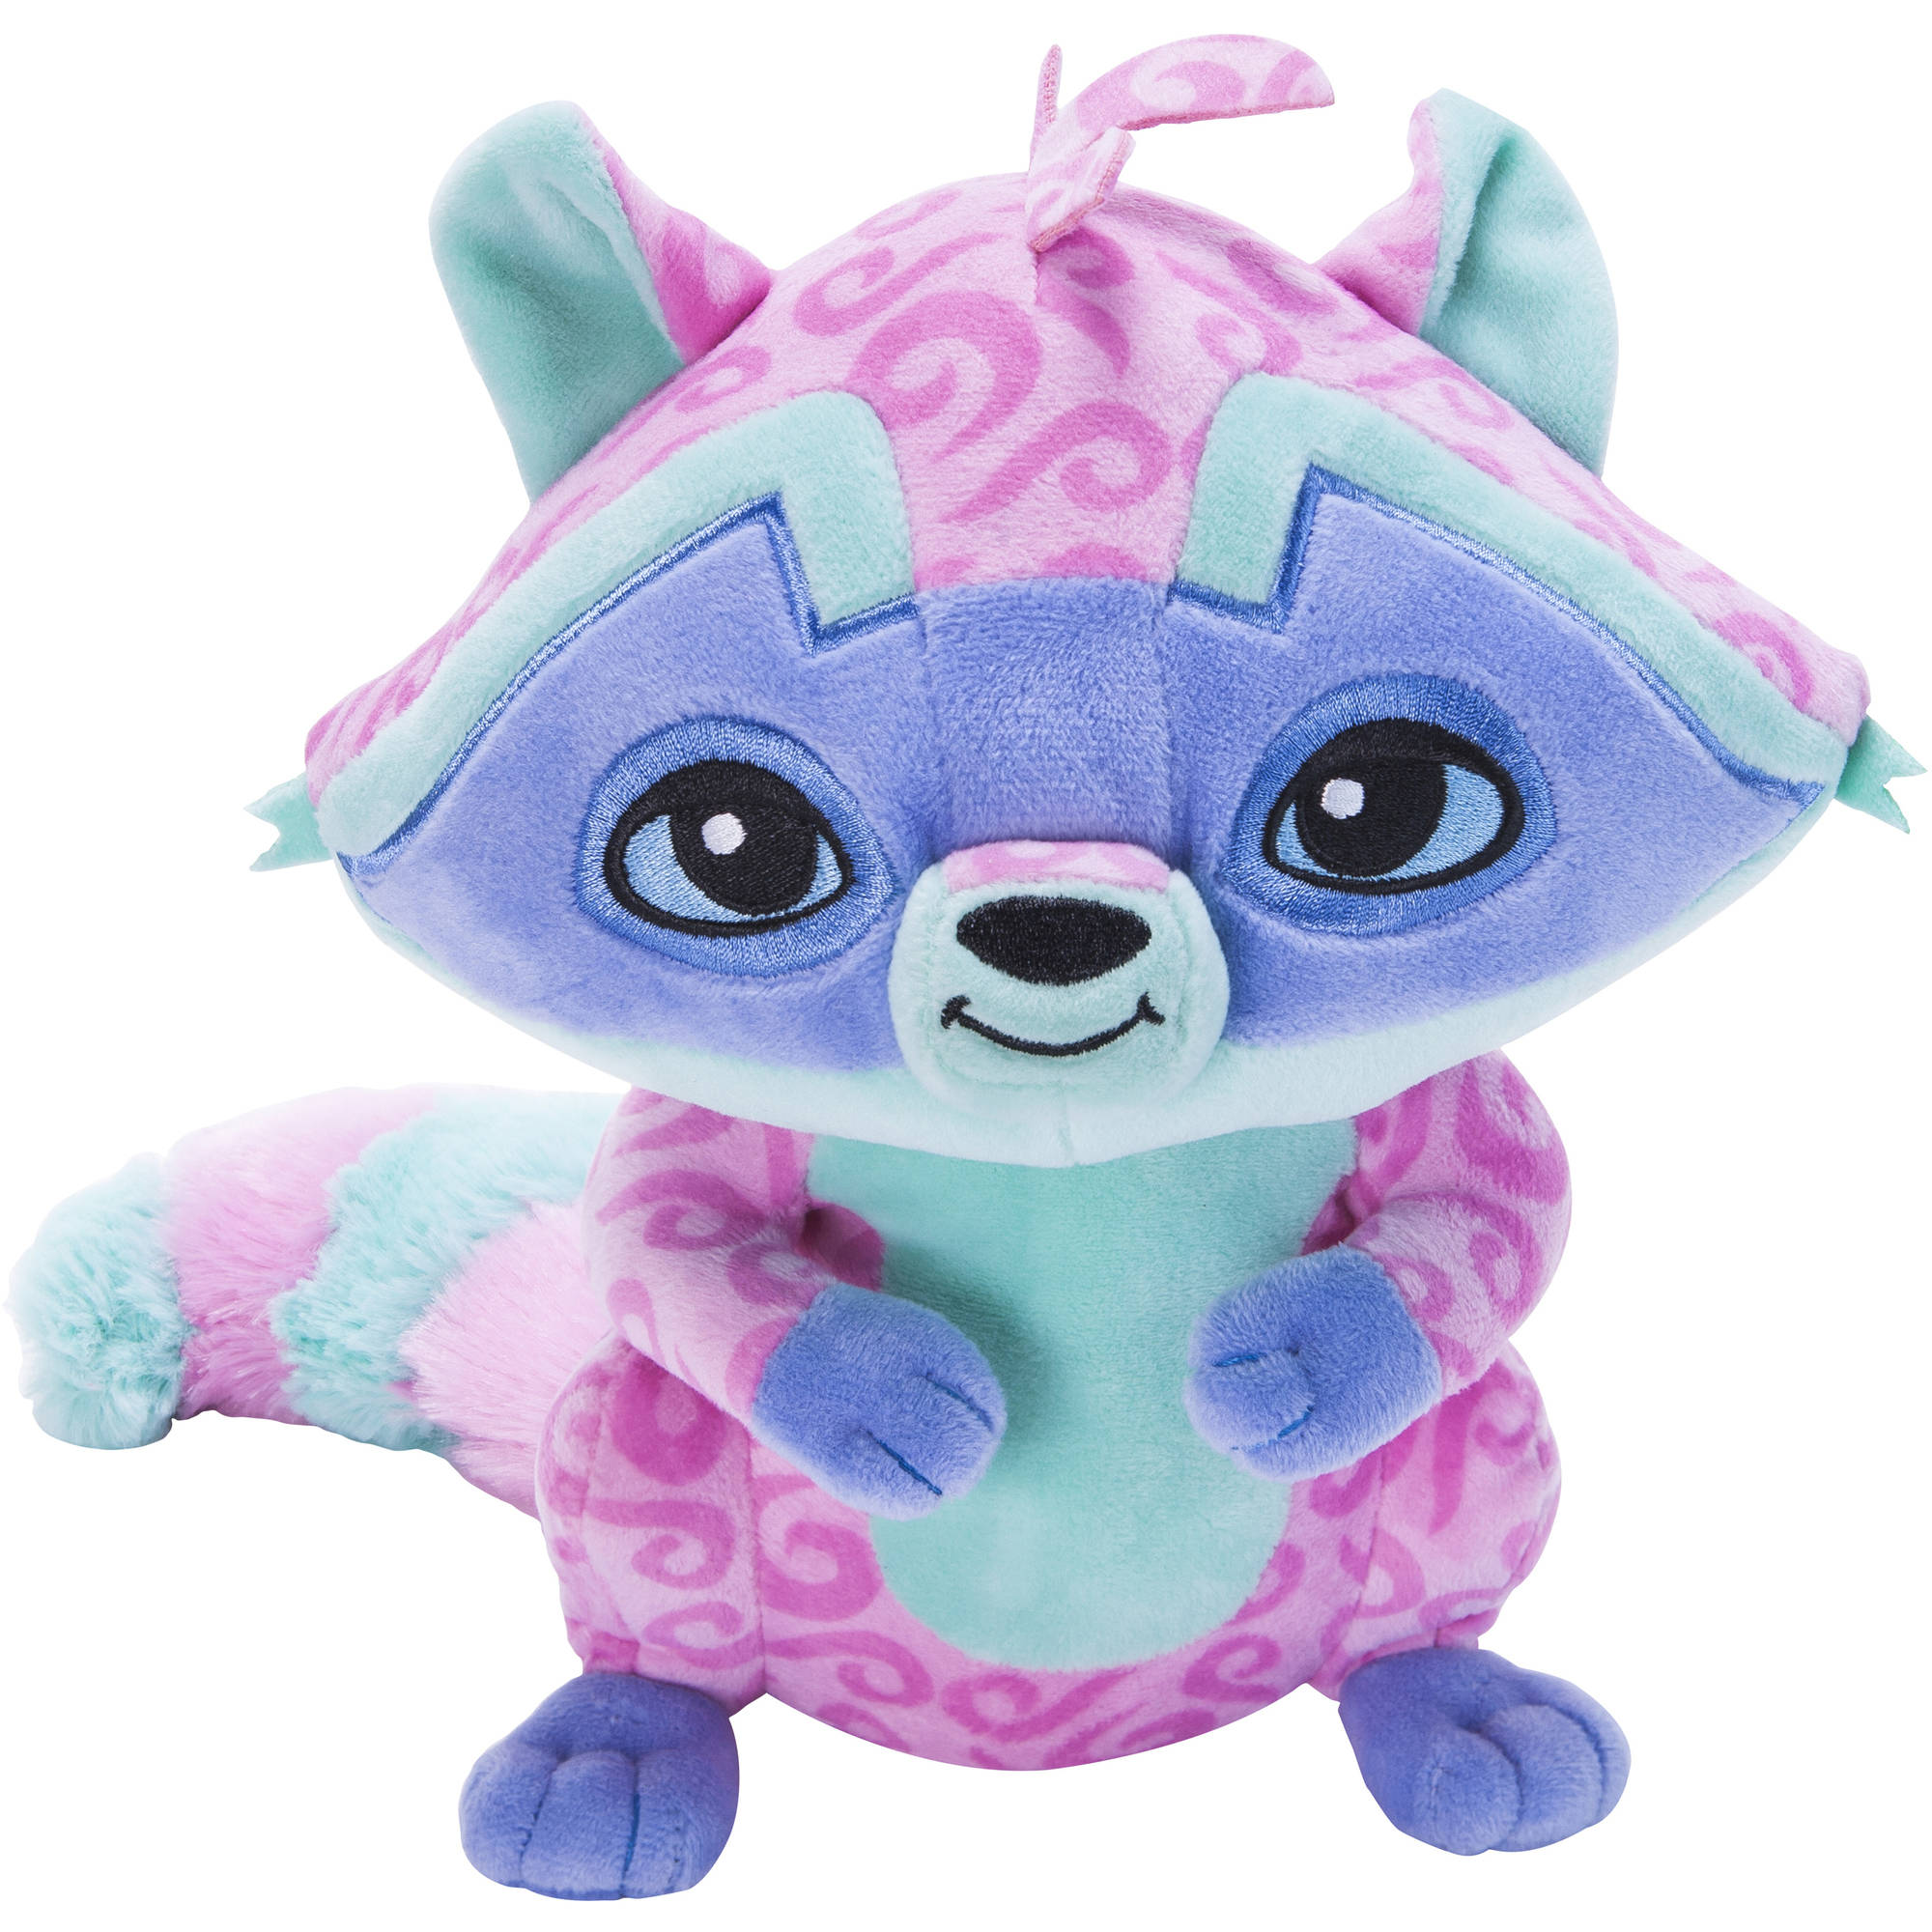 Animal Jam Cuddly Raccoon Plush